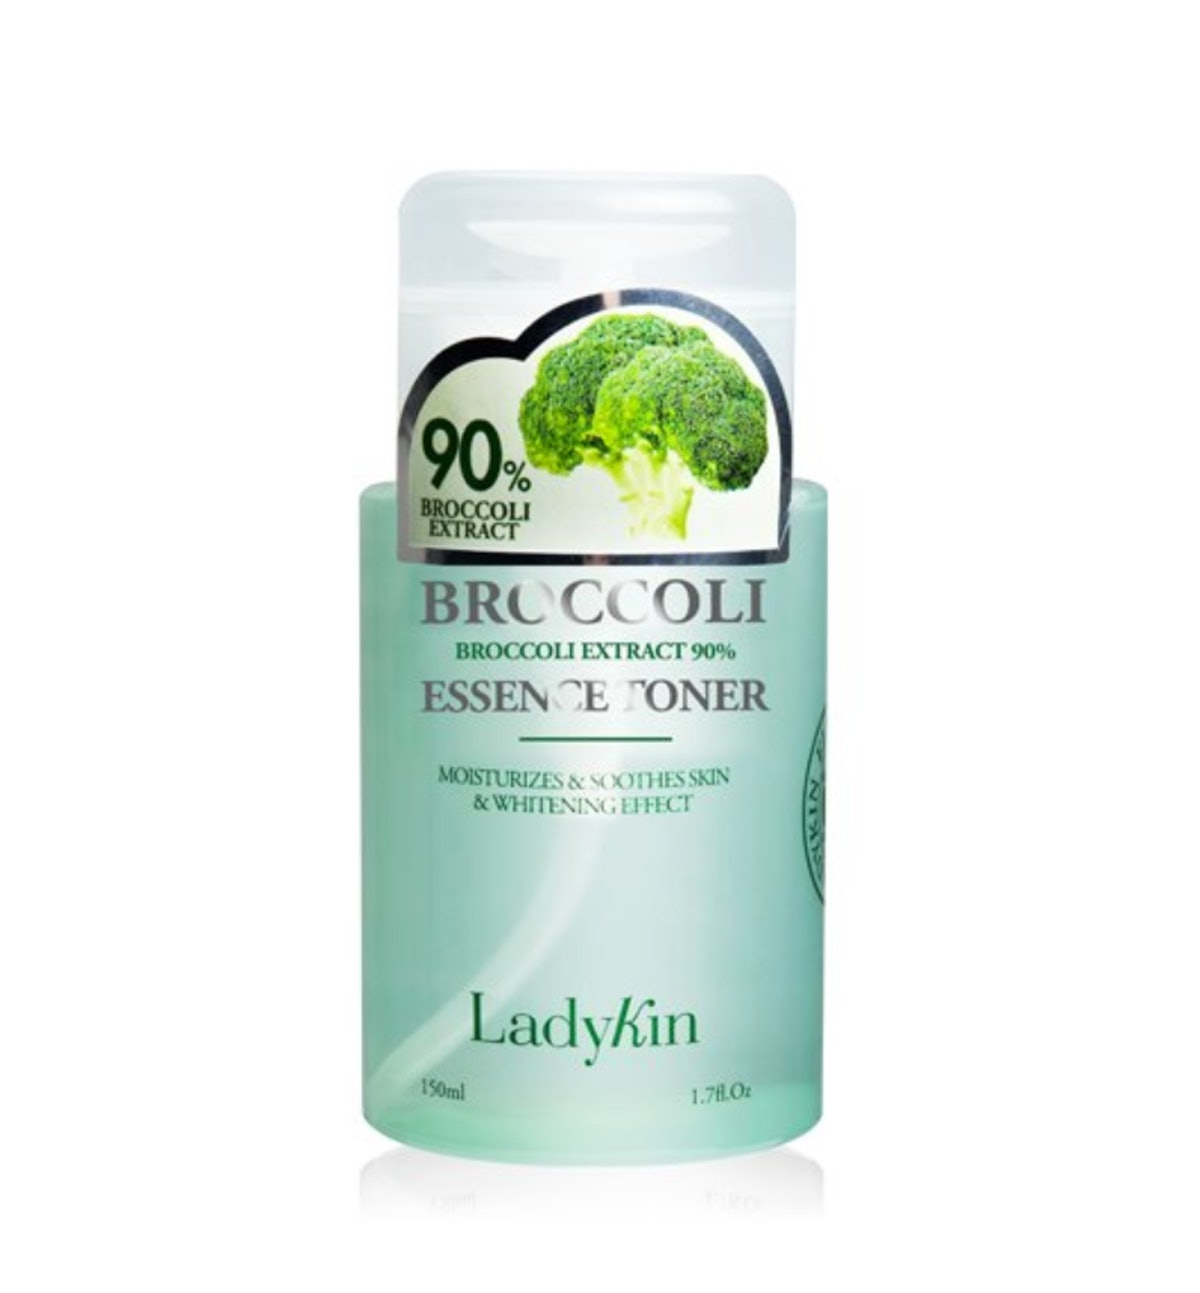 Ladykin Broccoli Essence Toner